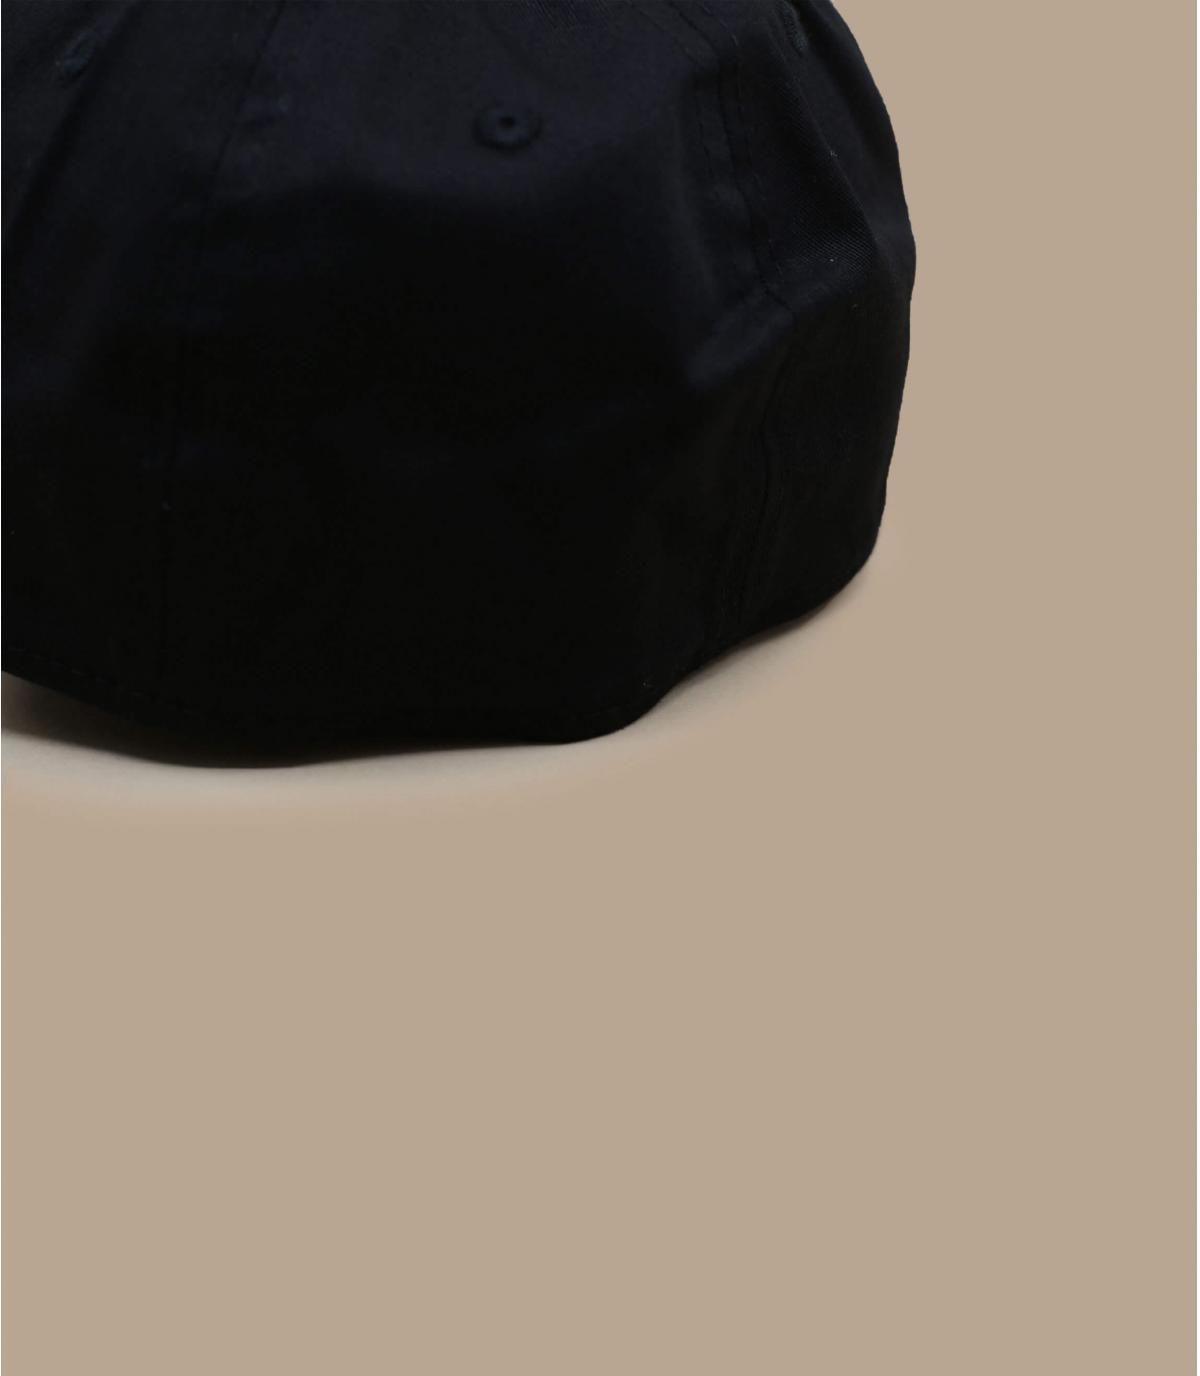 Dettagli 39thirty NY noir noir - image 4